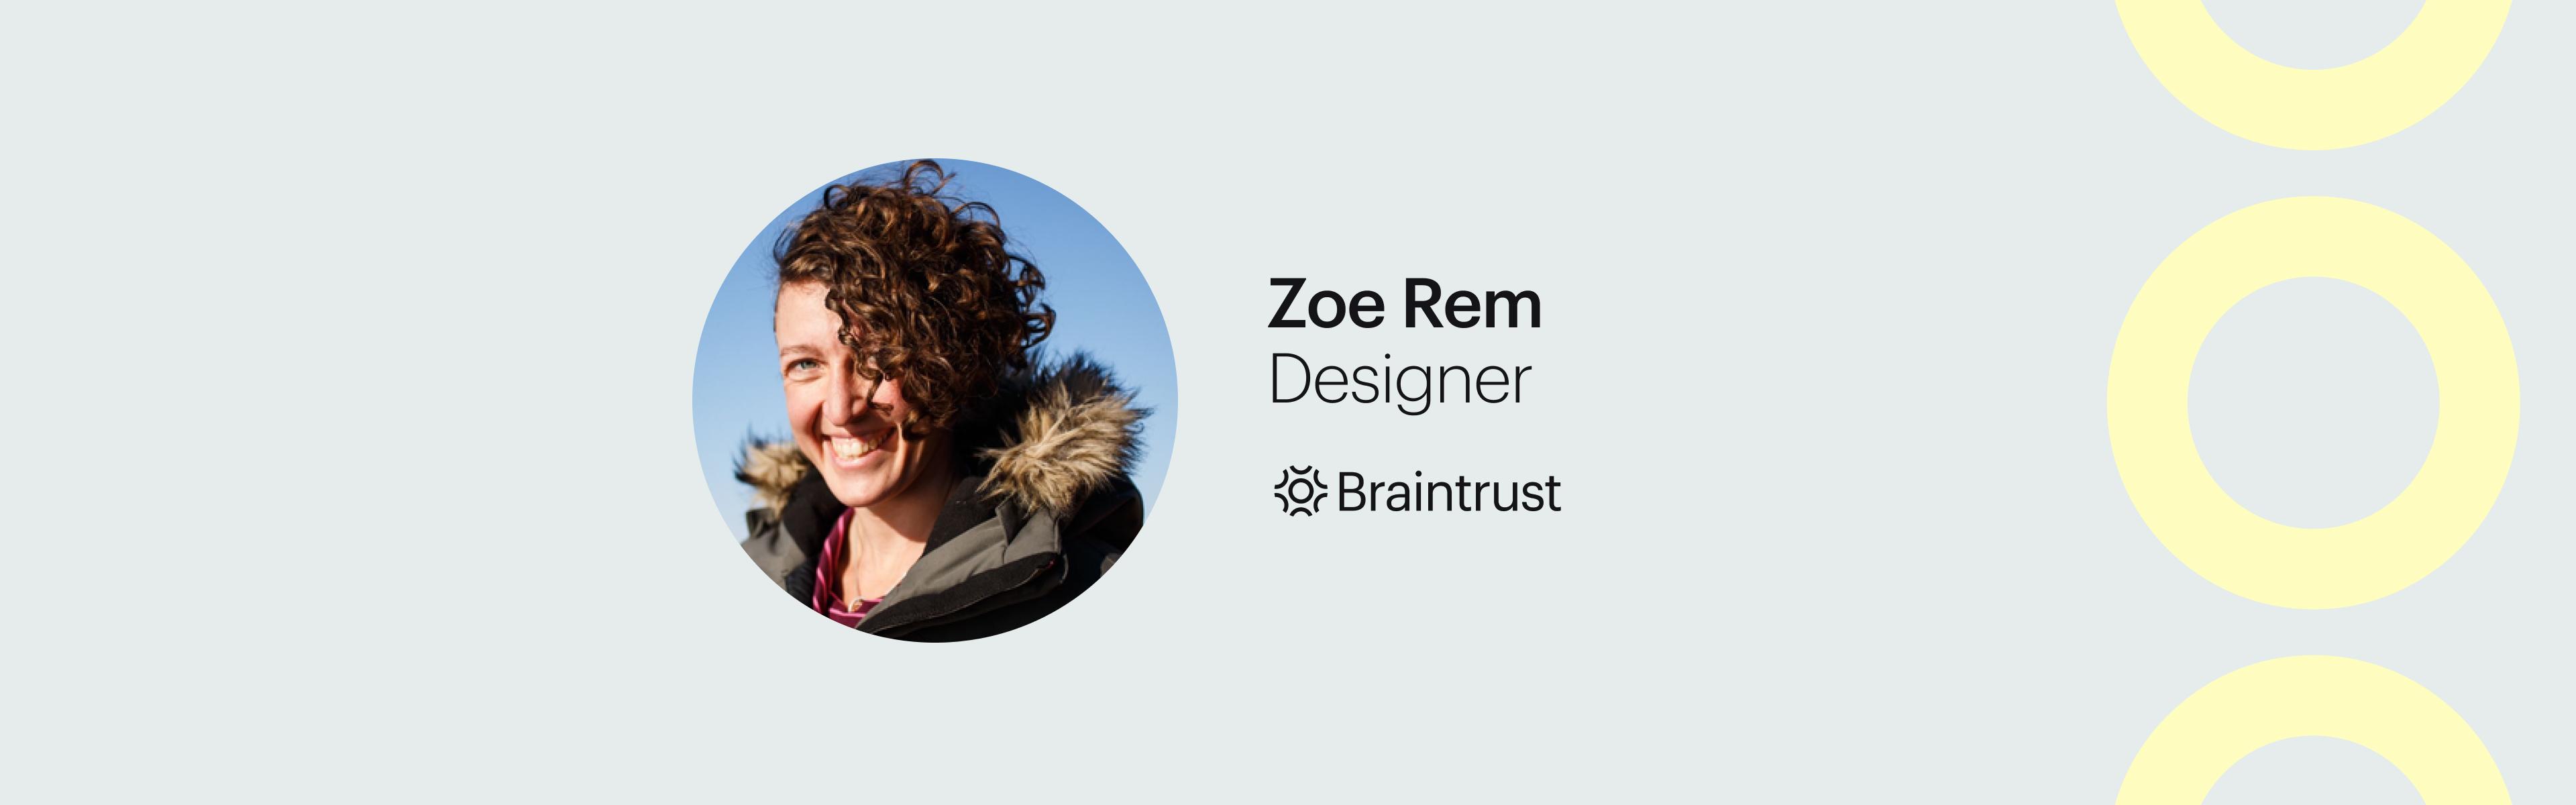 Talent Feature_ Zoe Rem Braintrust Blog Banner